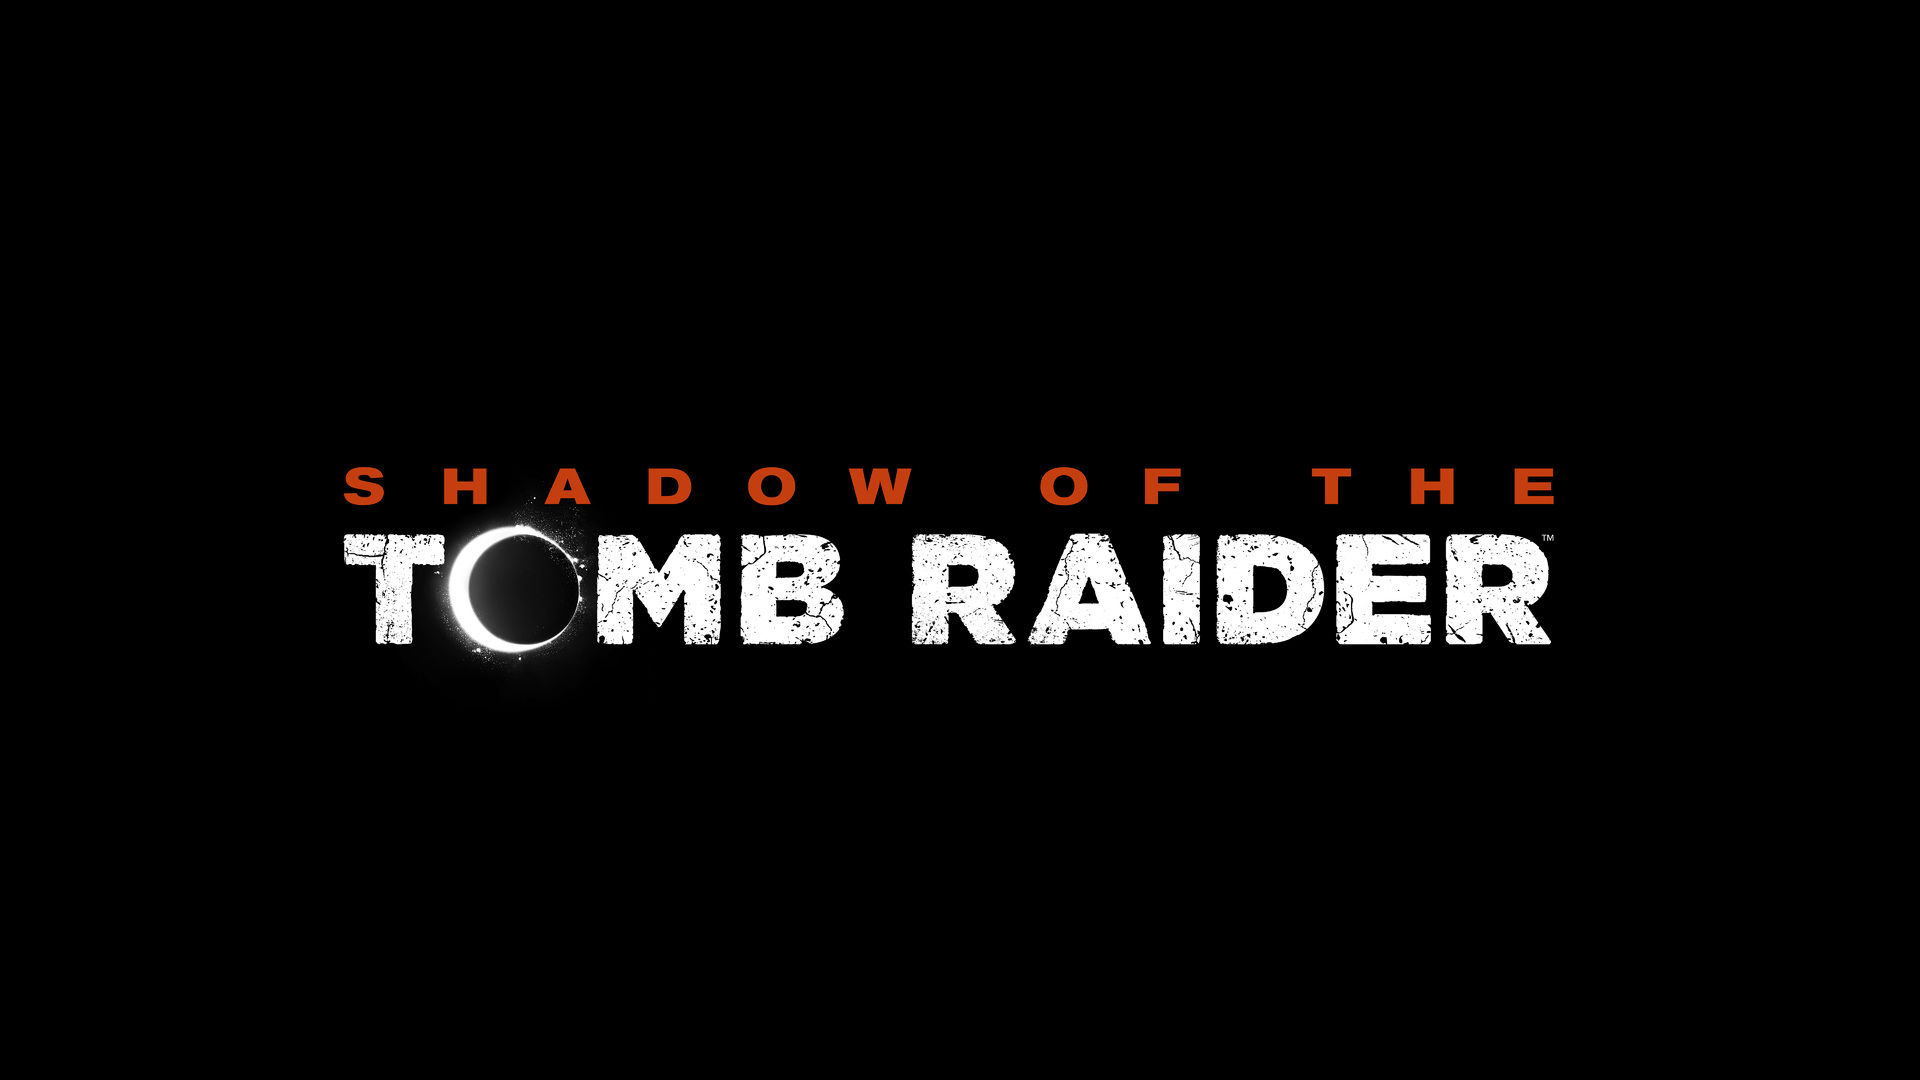 Обладатели Deluxe-издания Shadow of the Tomb Raider смогут играть на два дня раньше релиза